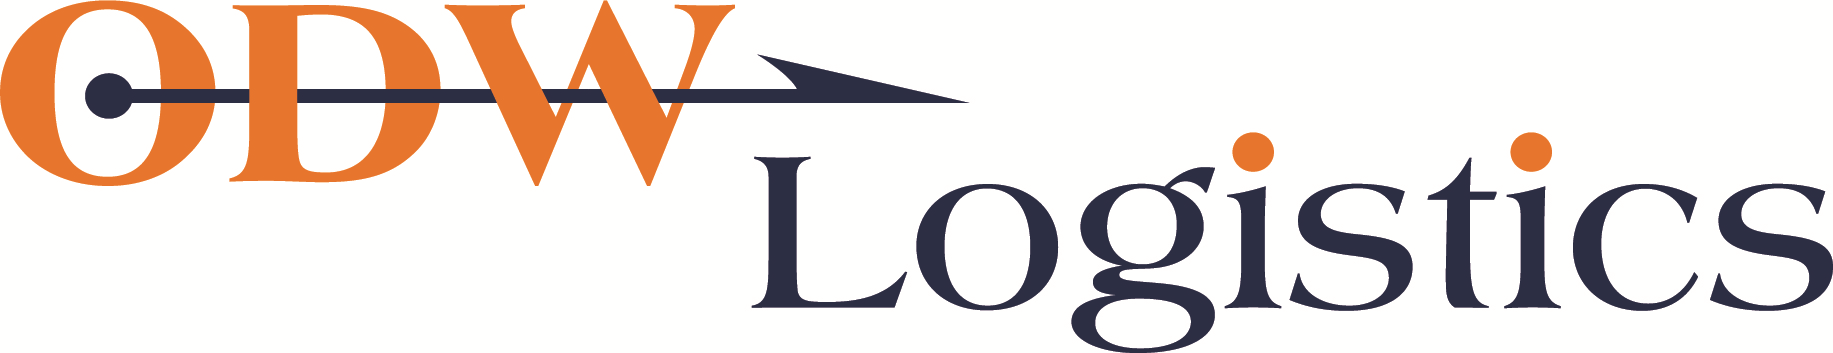 ODW Logistics & Transportation Services logo